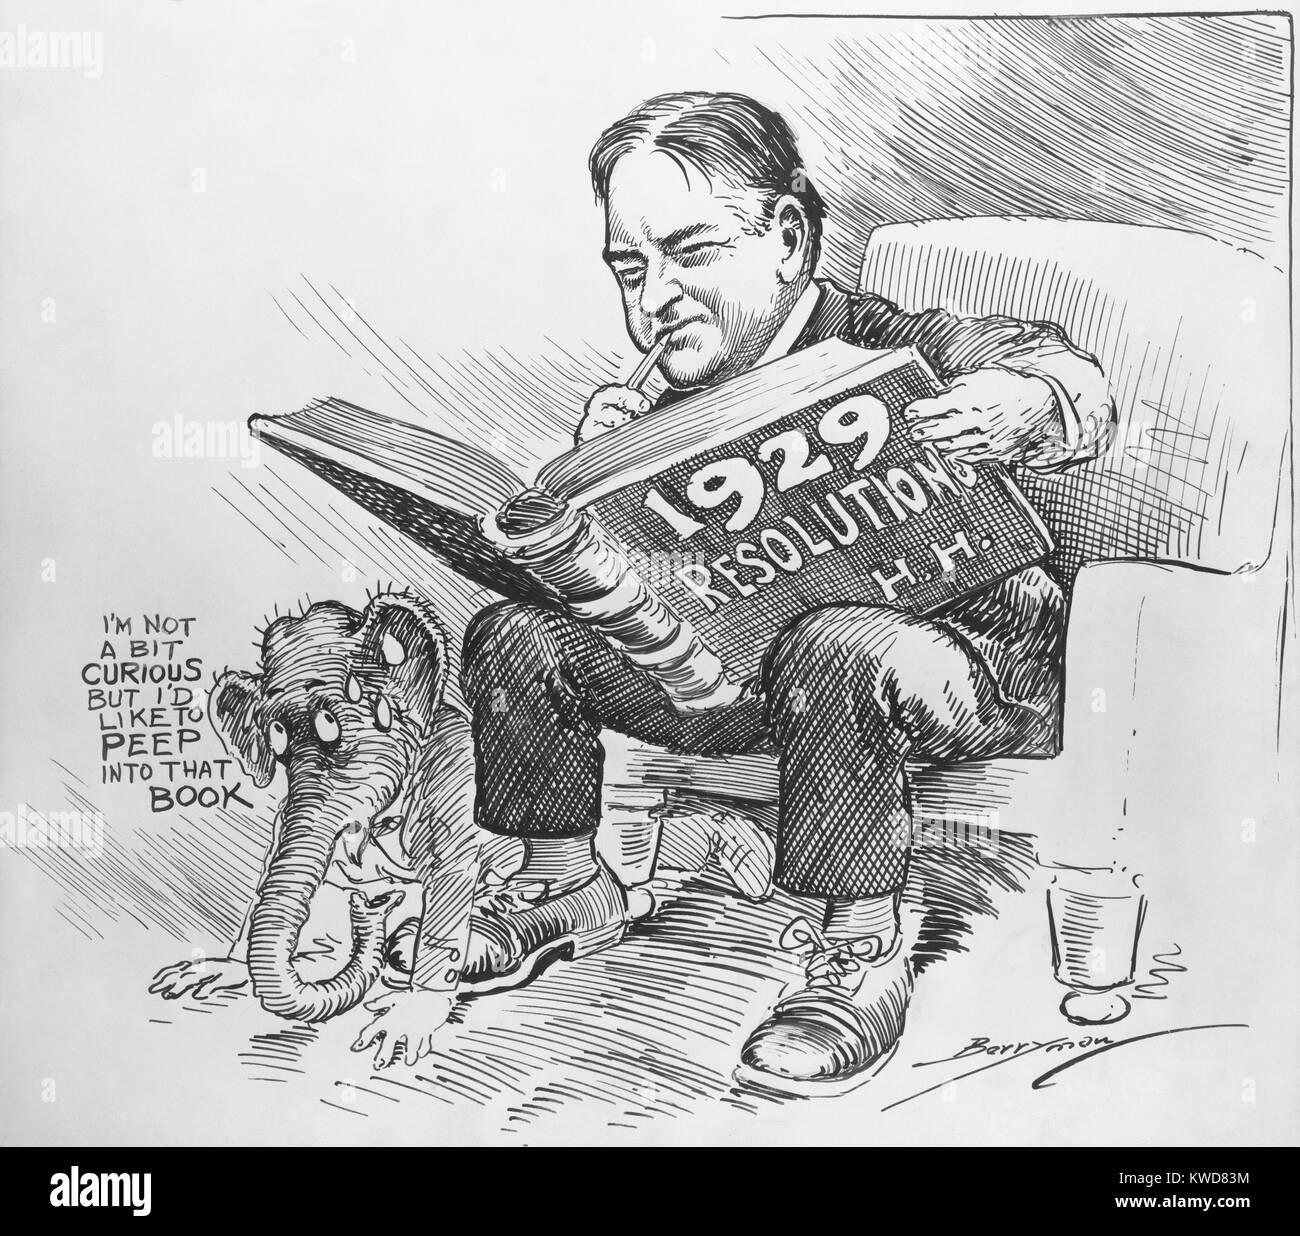 President Elect Herbert Hoover Reading A Book Entitled